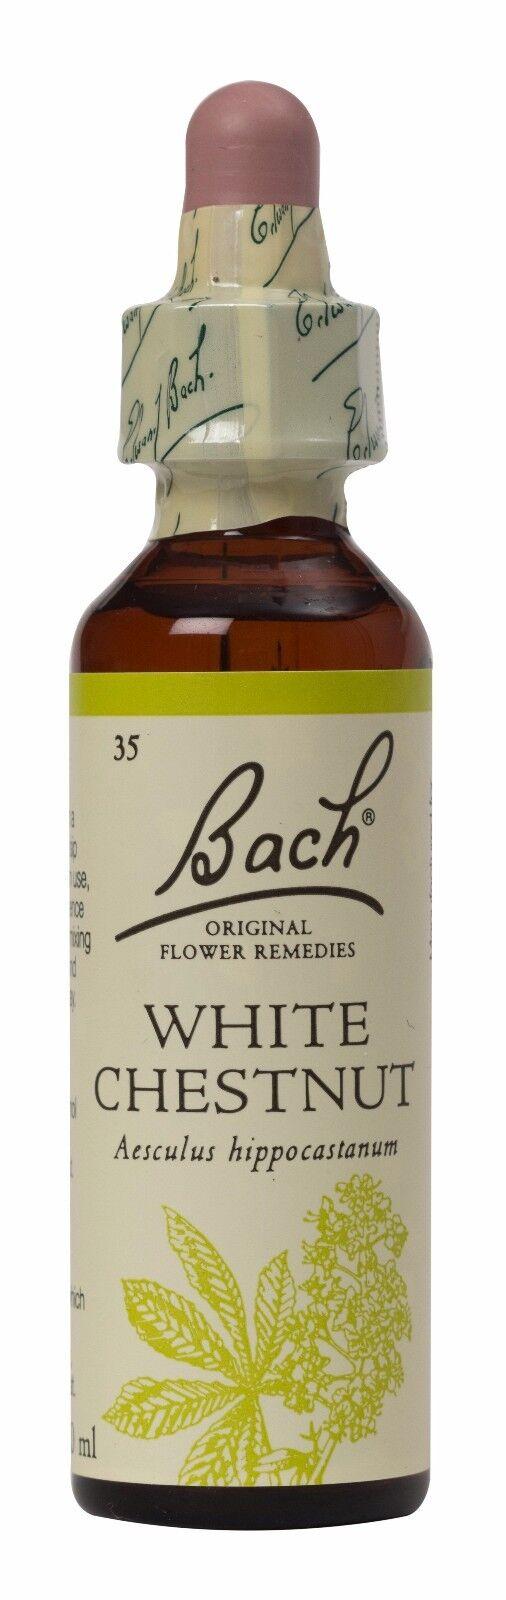 Bach Original Flower Remedies White Chestnut Aesculus Hippocastanum